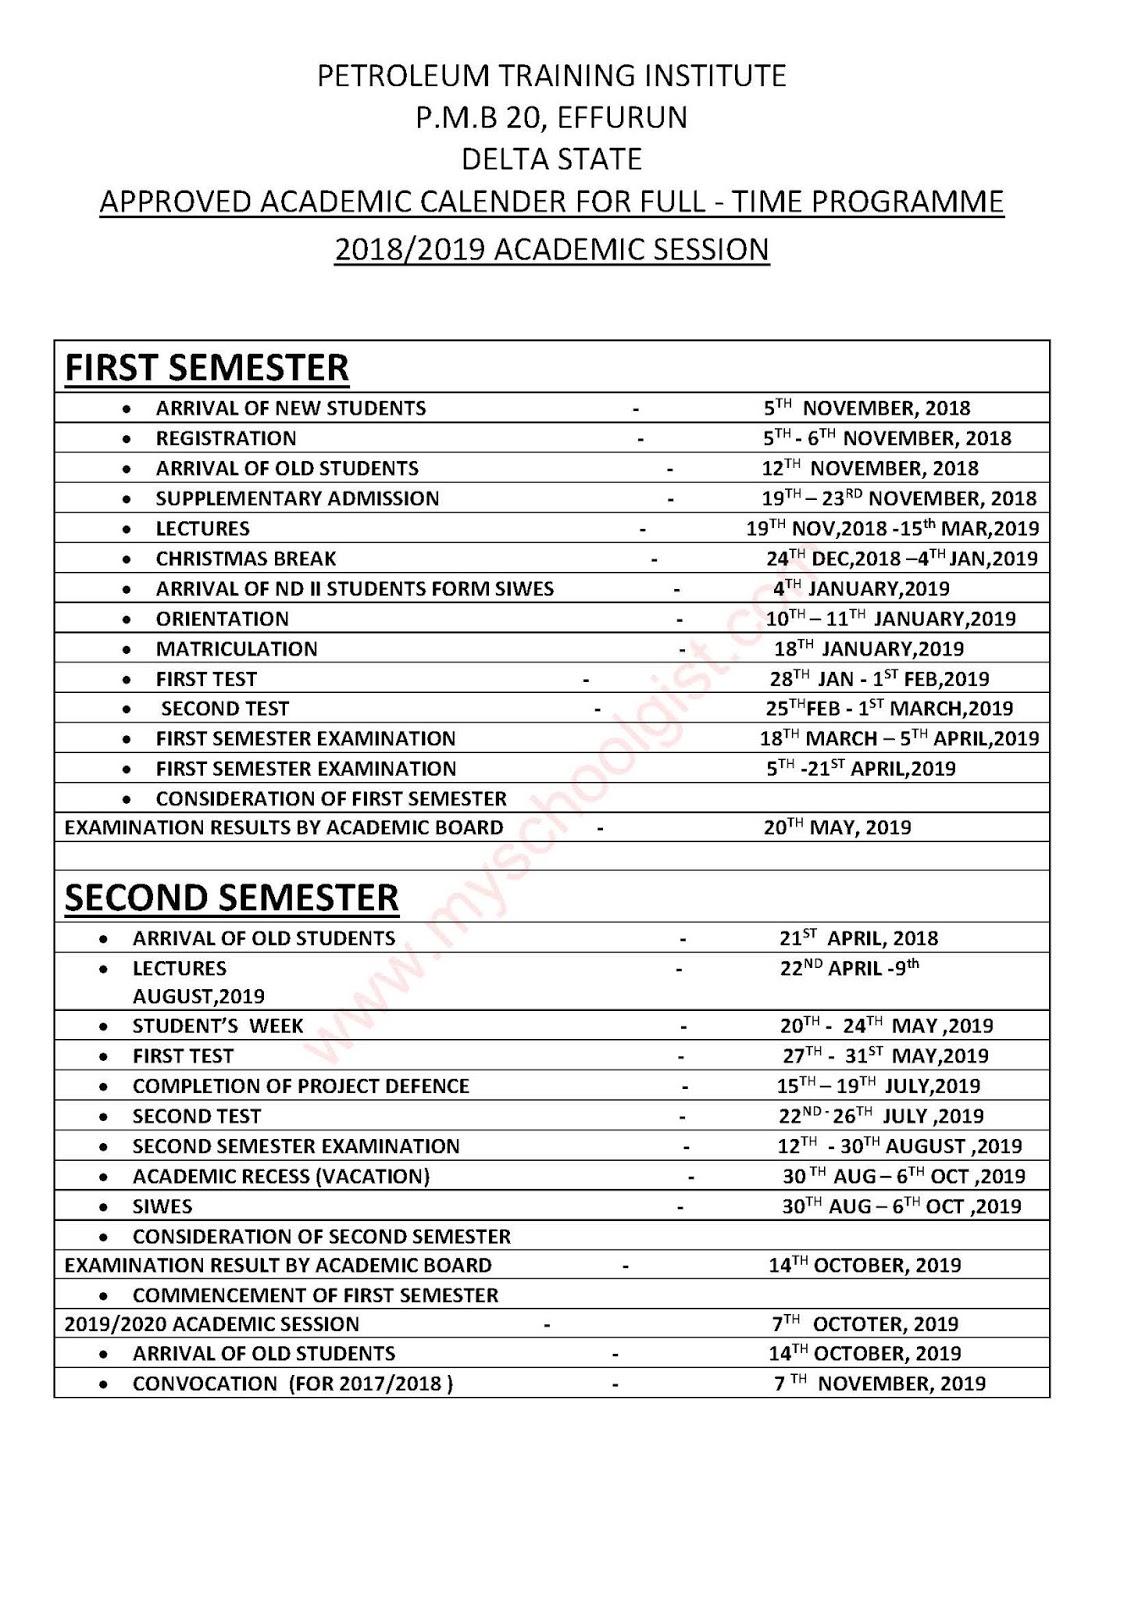 Petroleum Training Institute Academic Calendar 2018 2019 Is Out Current School News